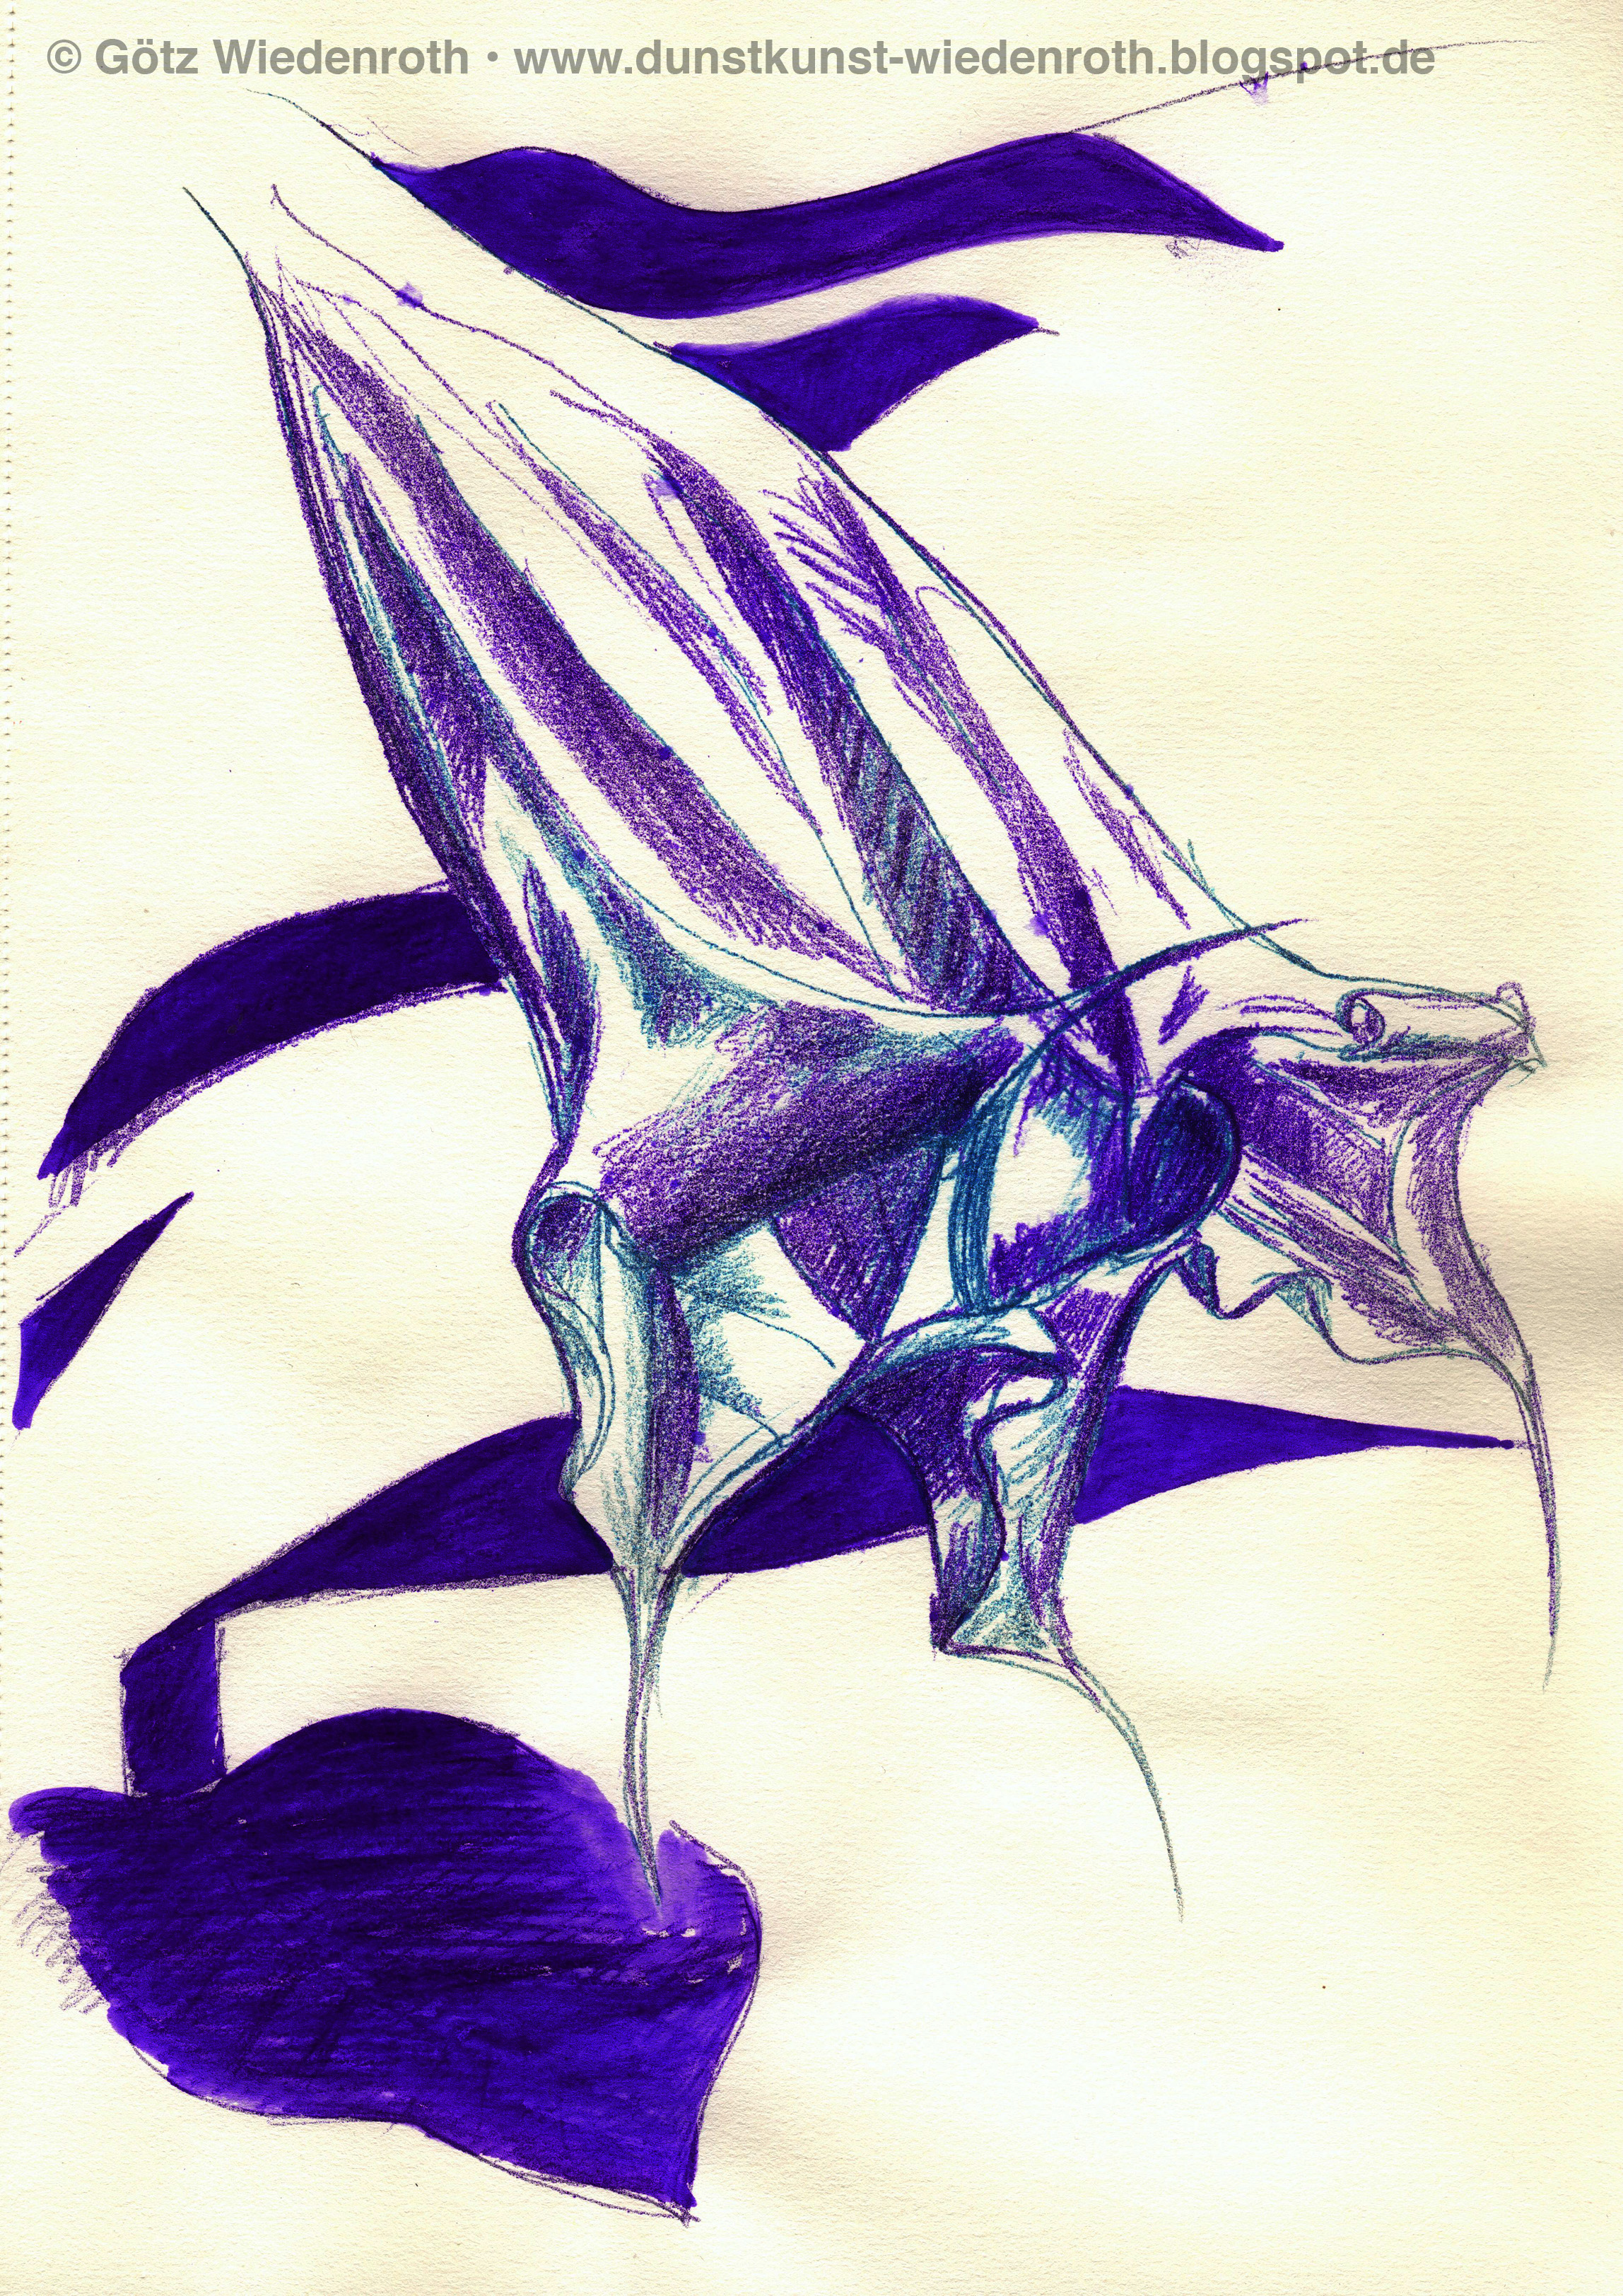 LME1_LEP_80322_Bluete_Pflanze_organische_Form.jpg